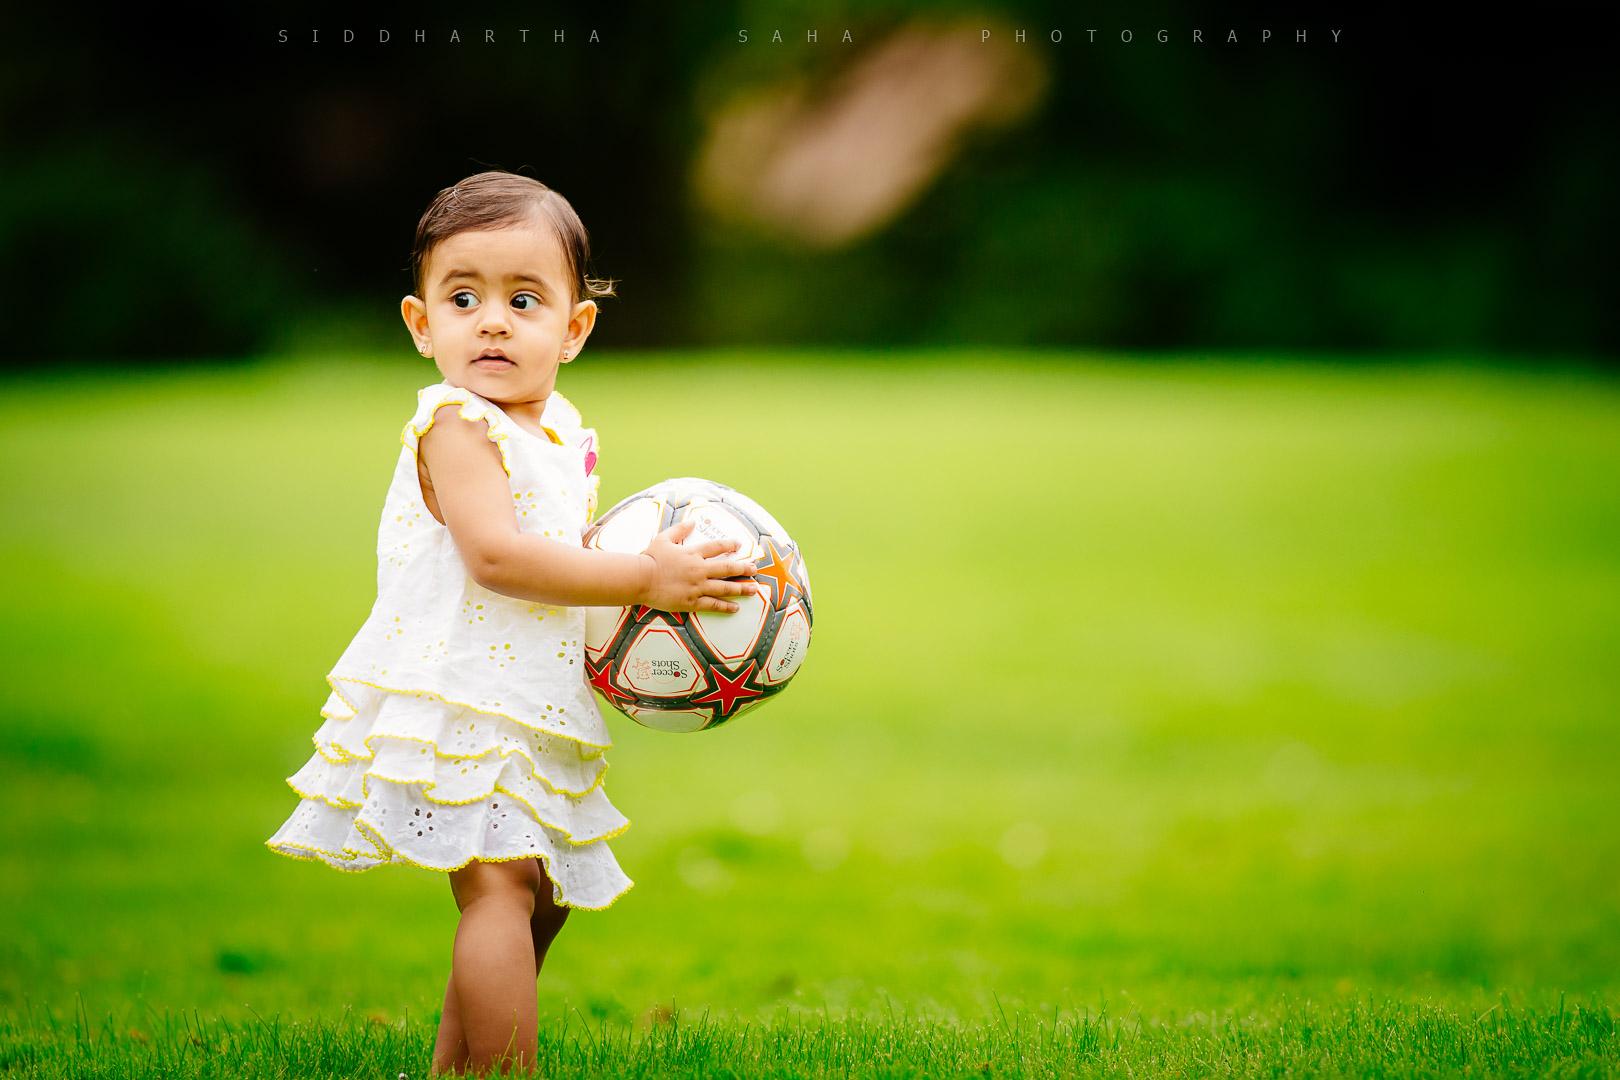 2015-08-08 - Padmaja Ketan Family Photoshoot - _05Y7974